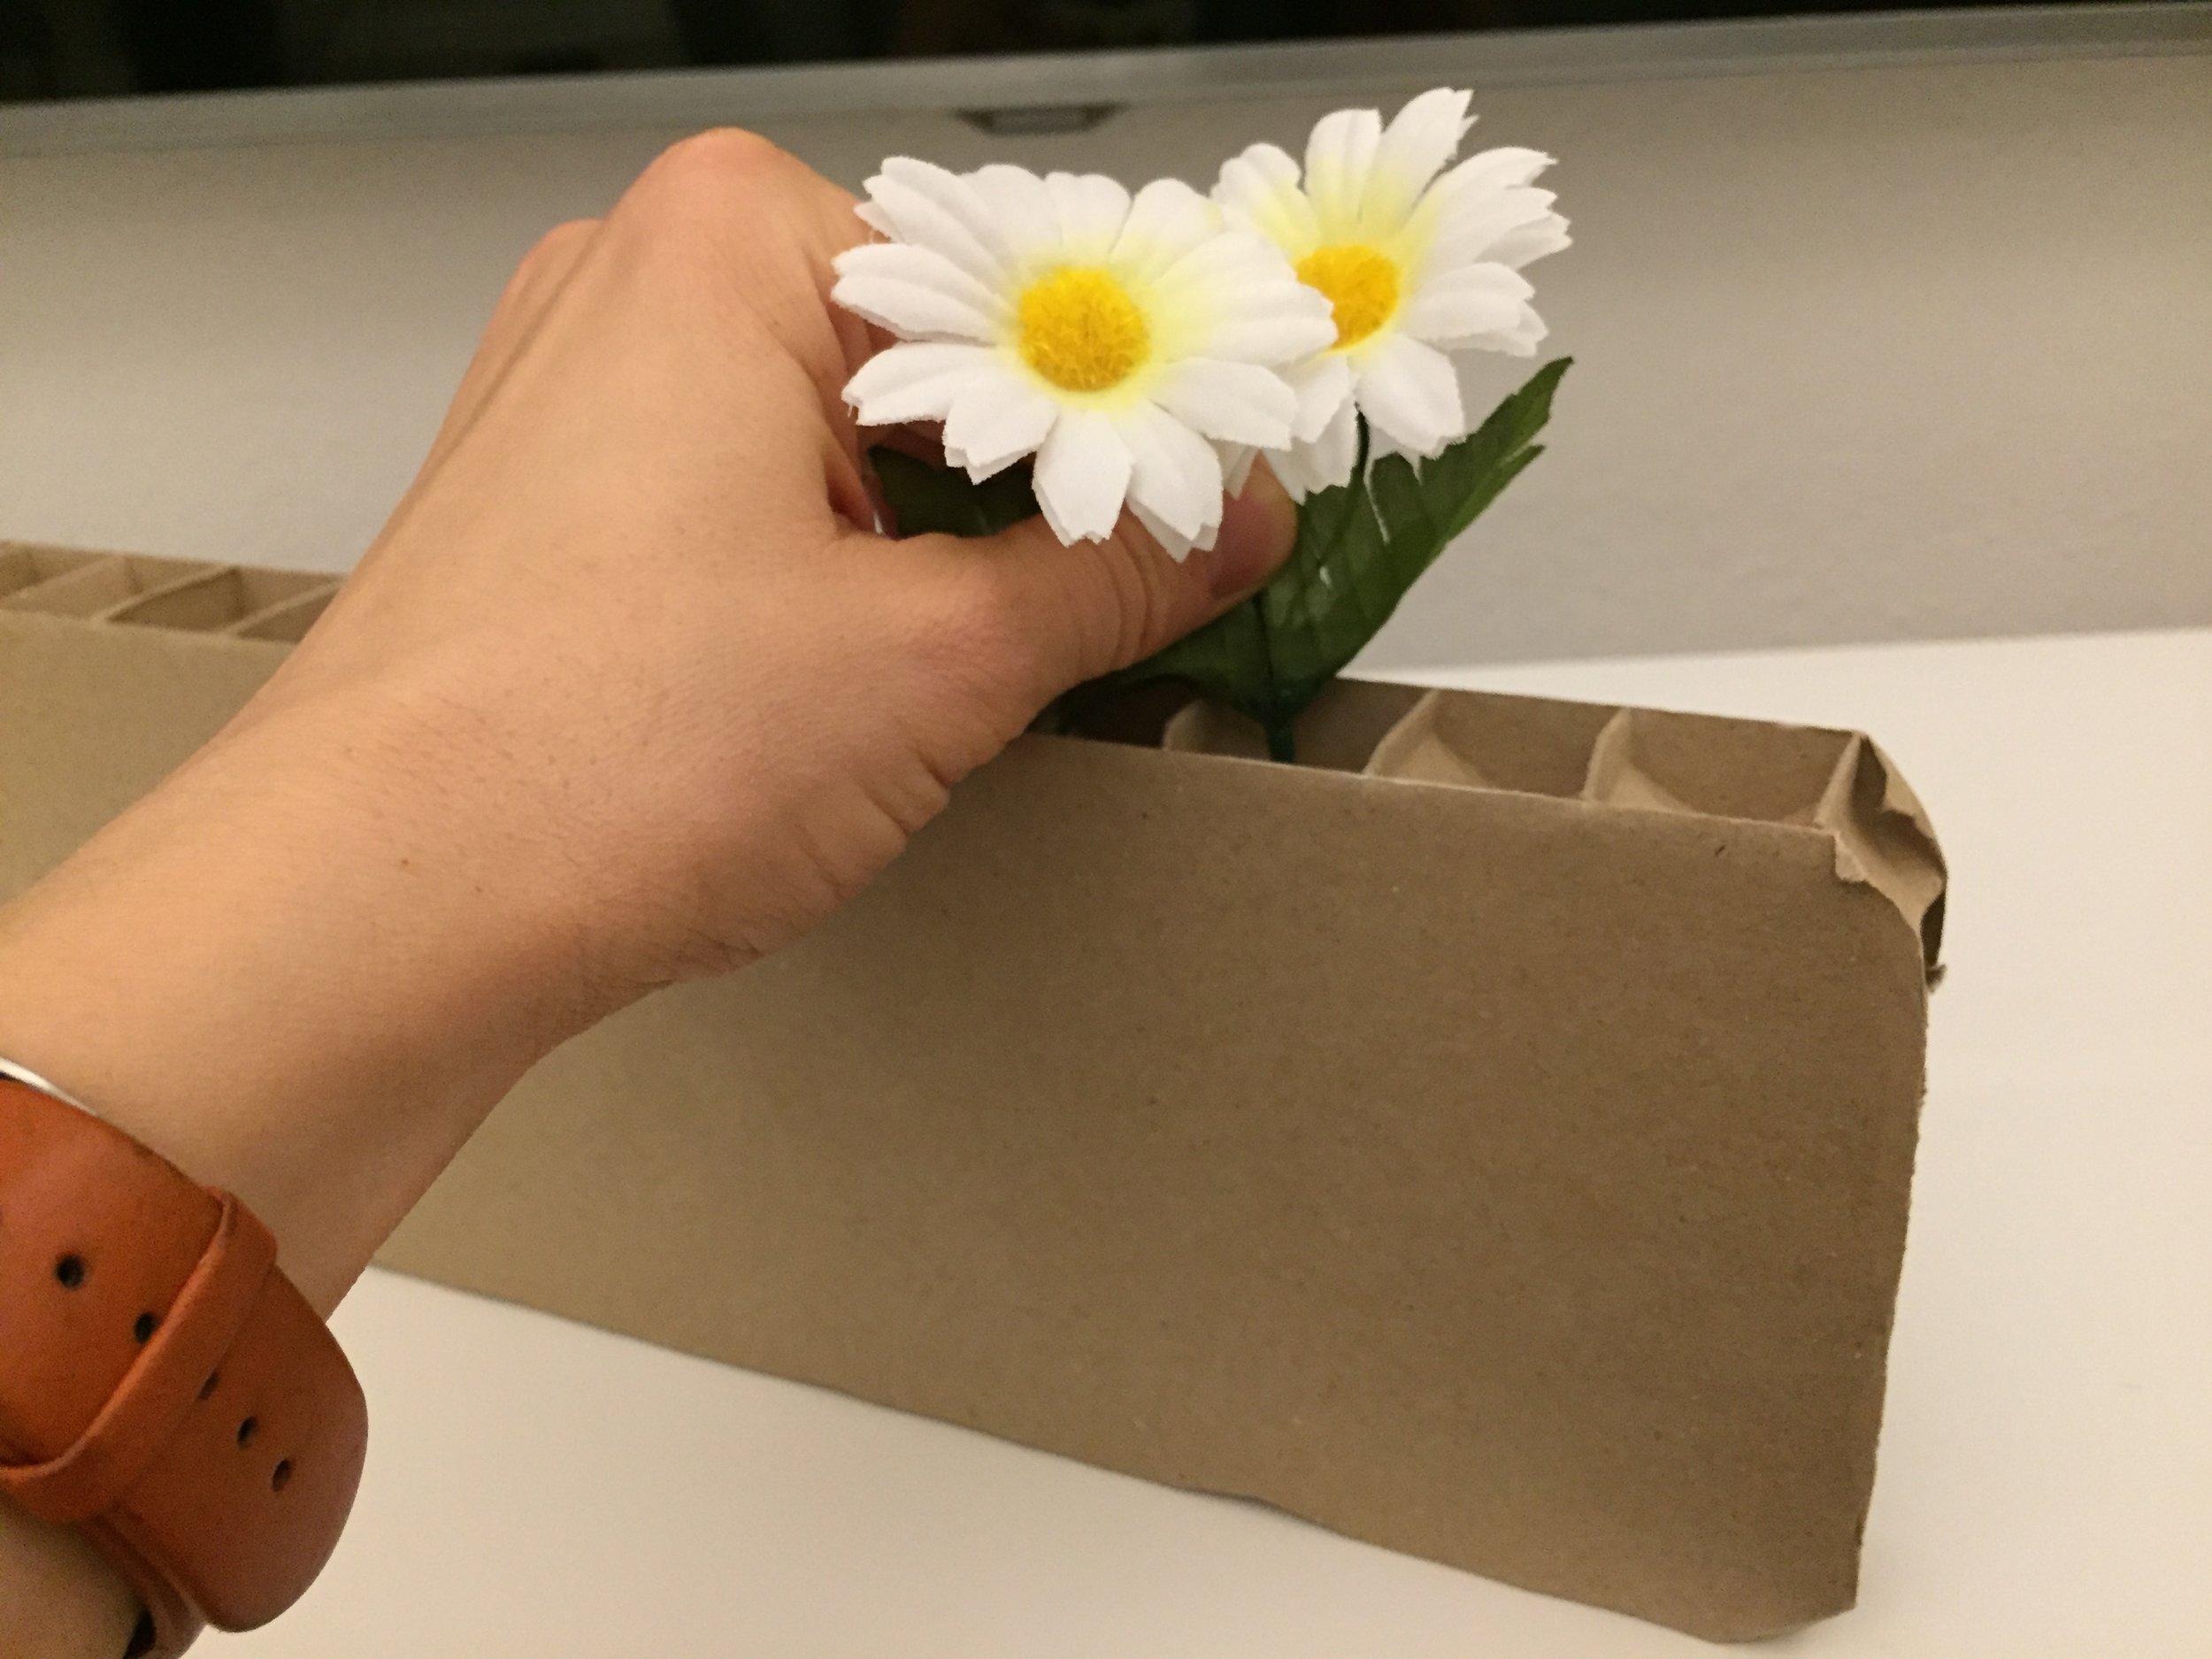 Pierced side of cardboard with plastic flowers.